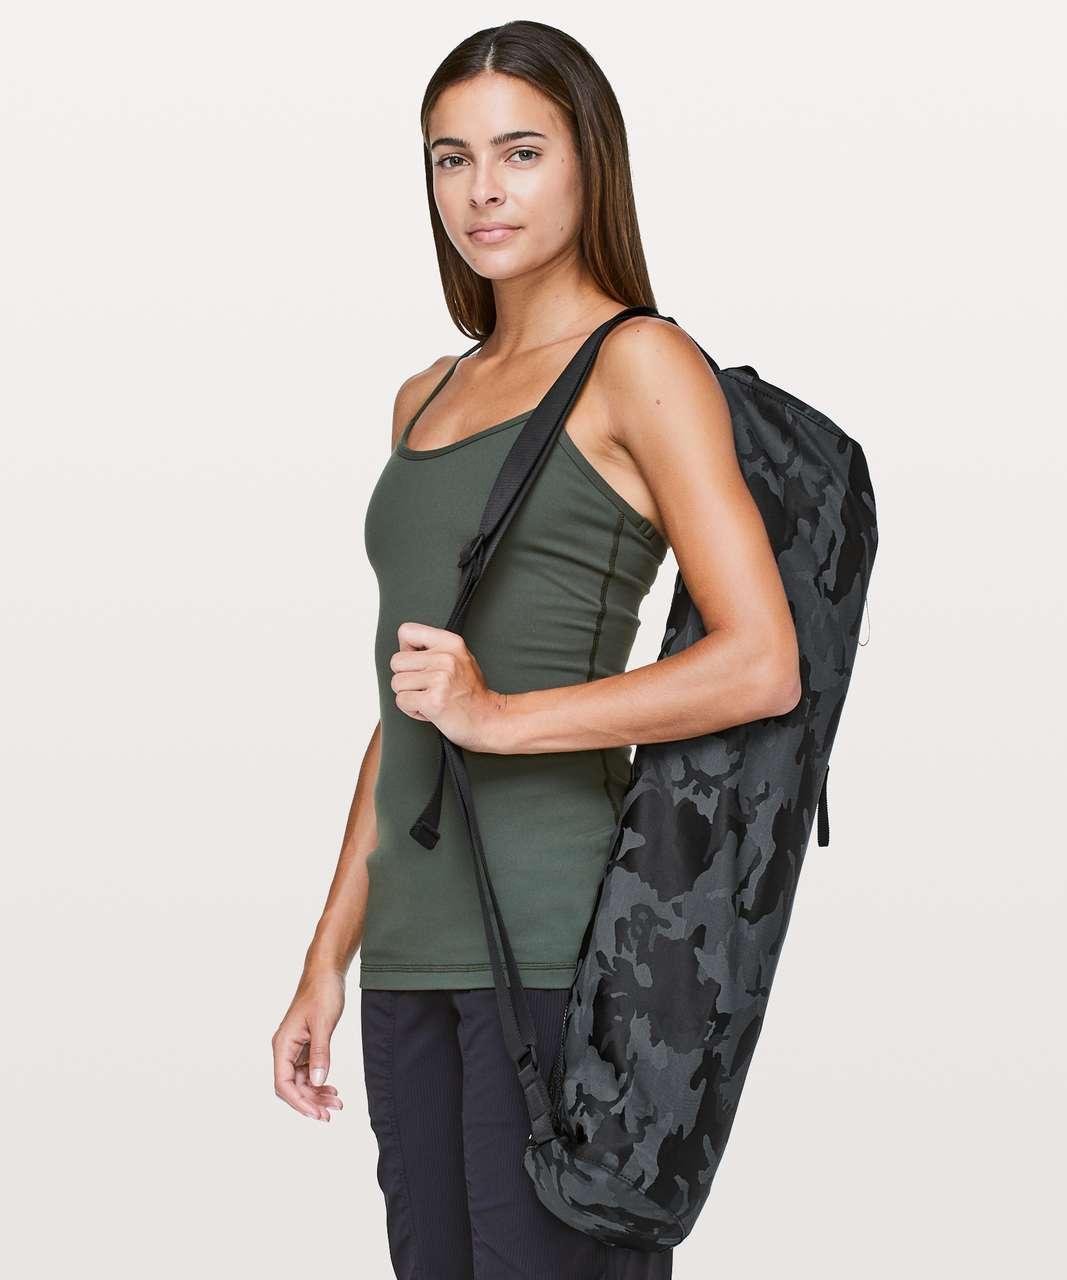 Lululemon Get Rolling Yoga Mat Bag *17L - Jacquard Camo Cotton Obsidian / Black